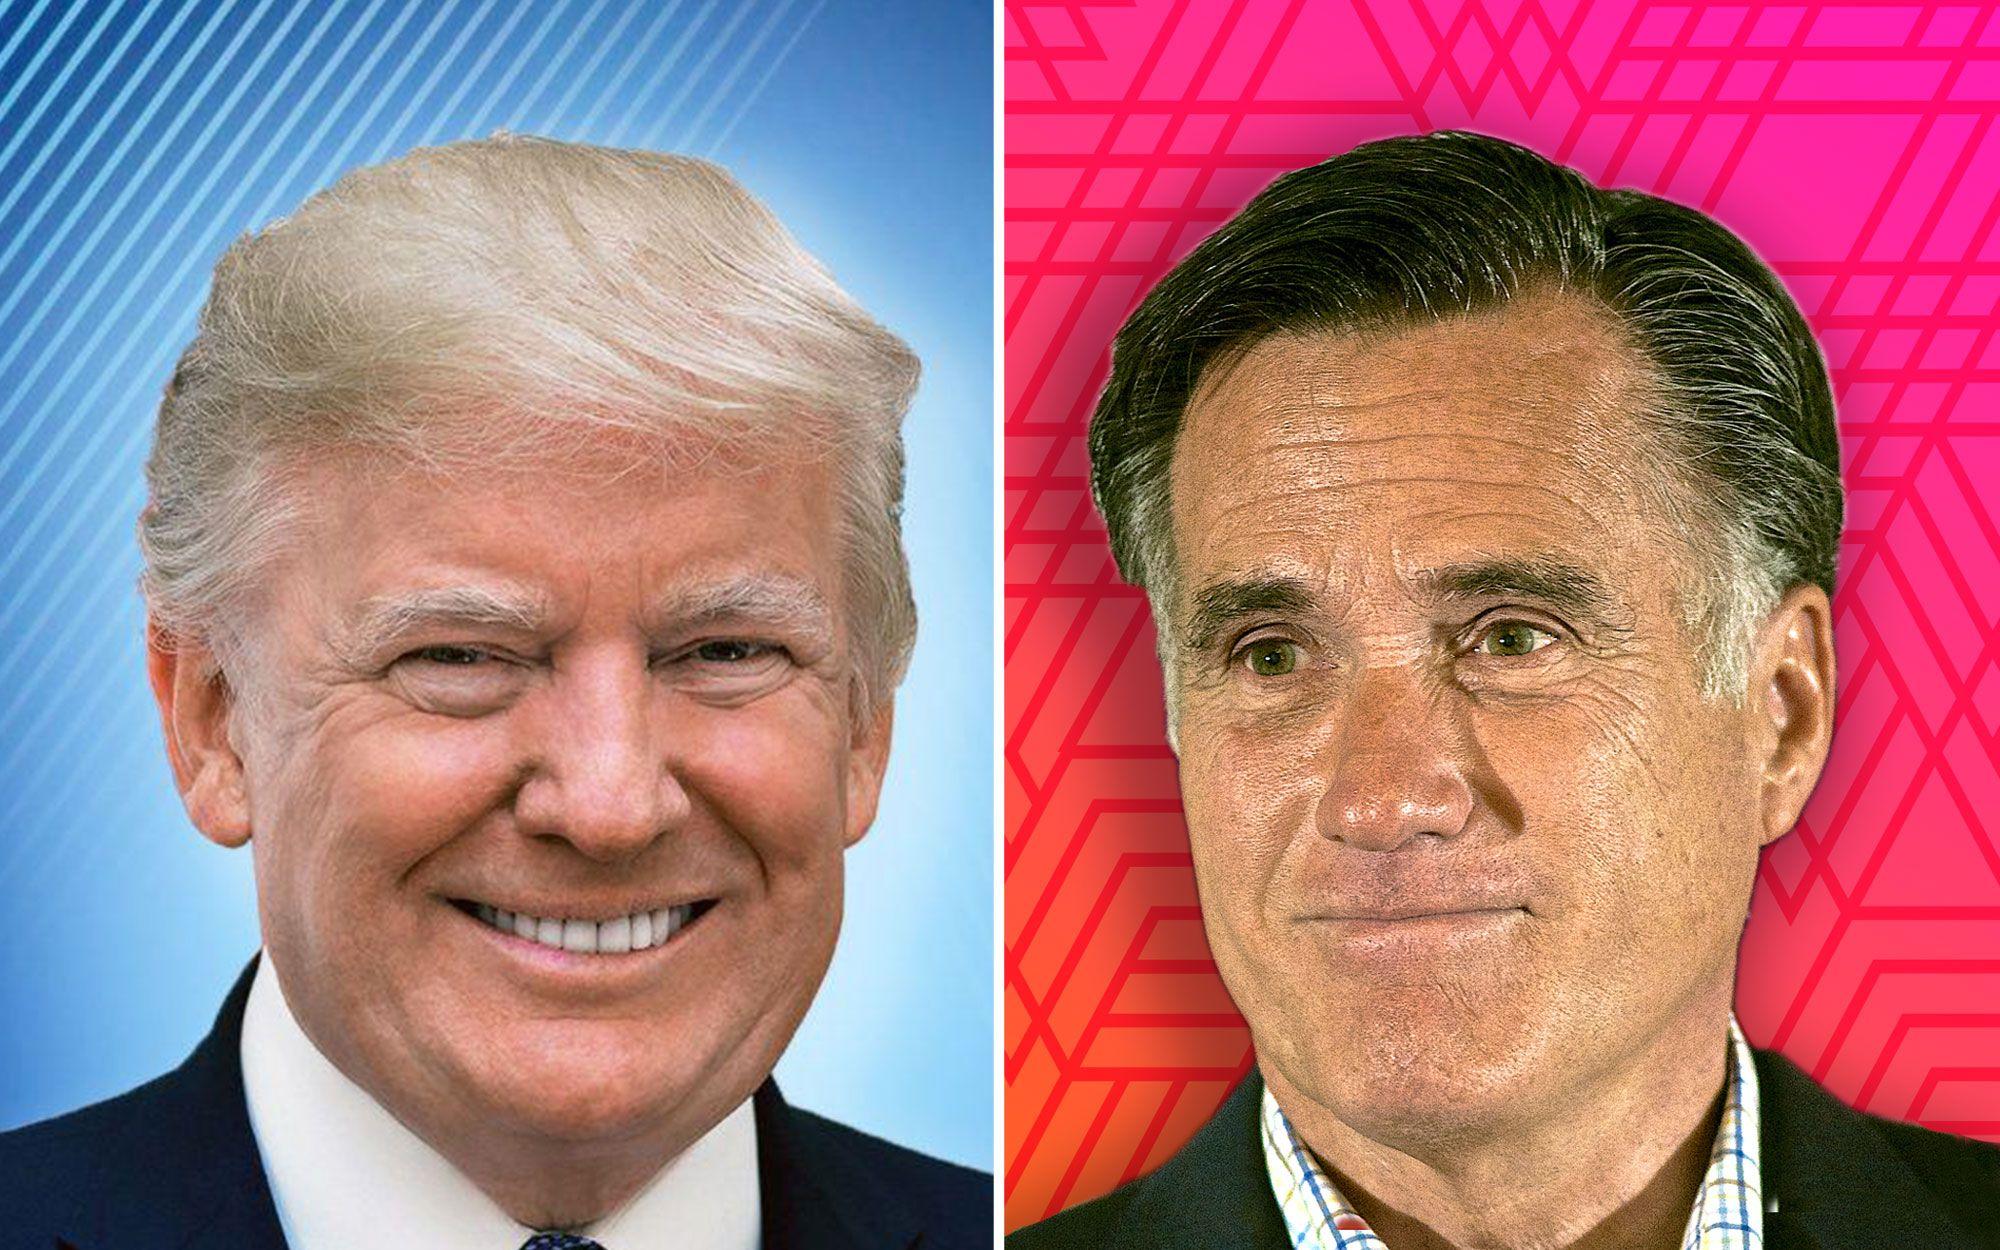 Romney Defends the 'Heroic' John McCain Against Trump's Criticisms